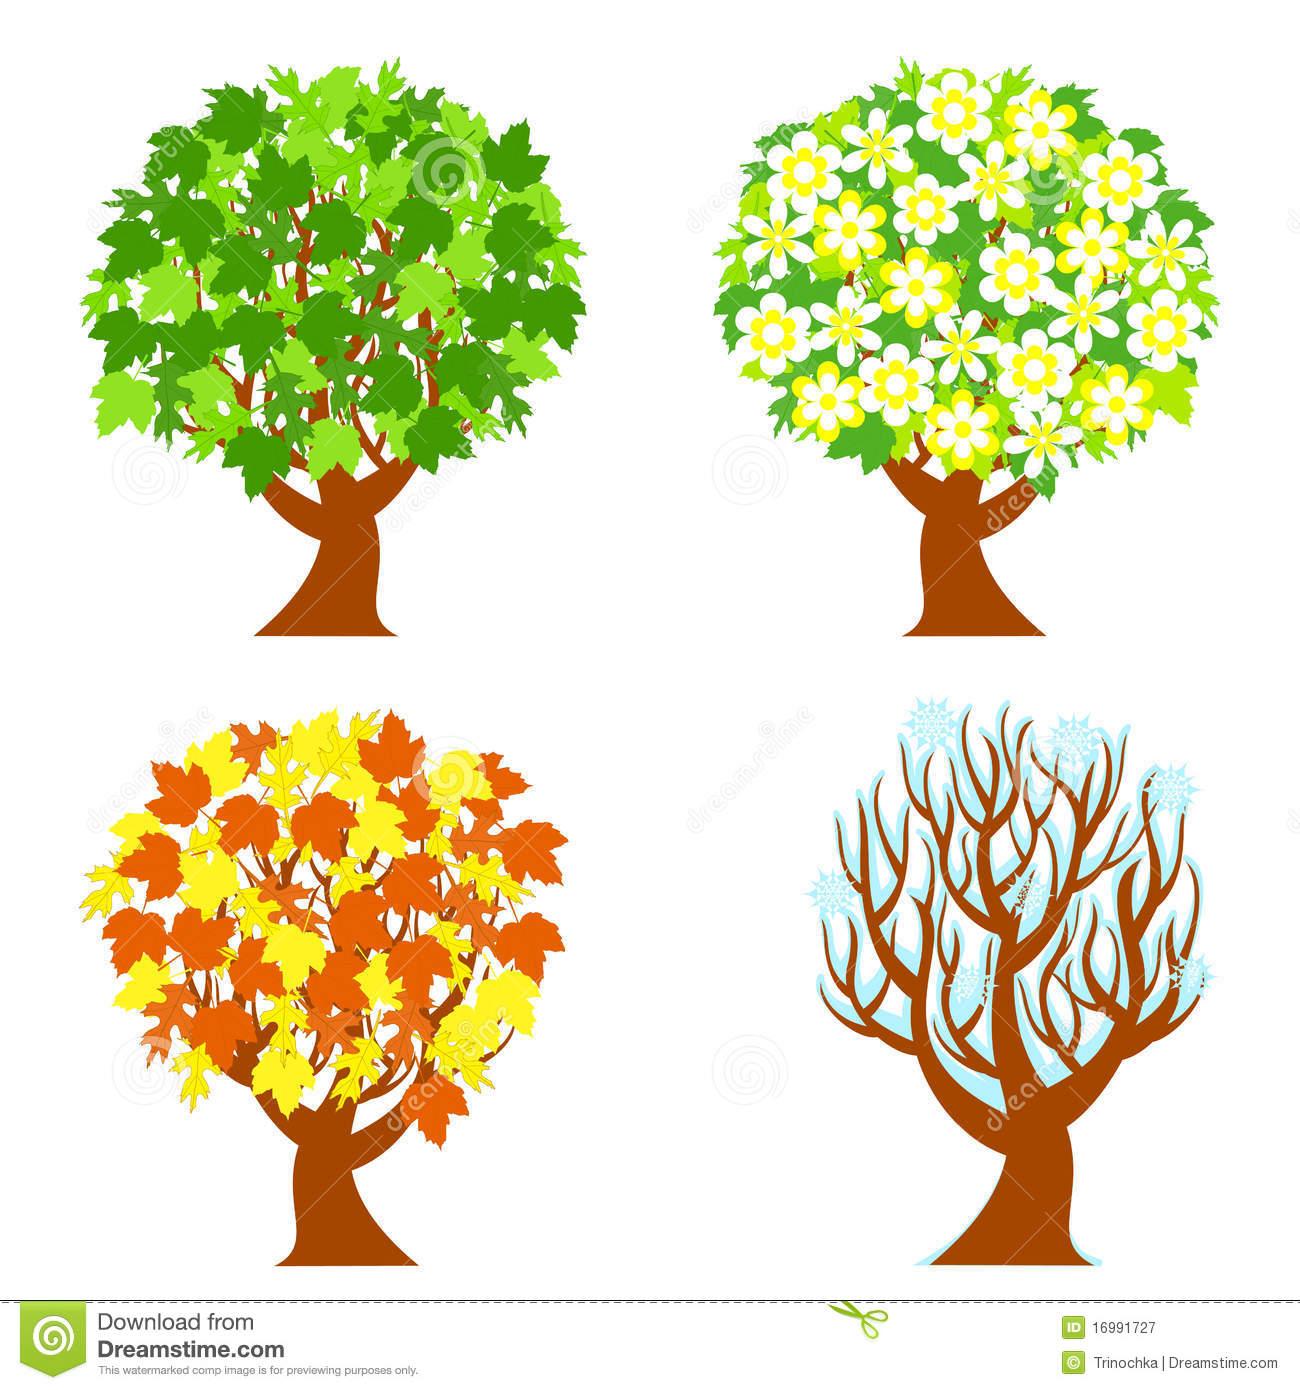 Season clipart summer tree #14